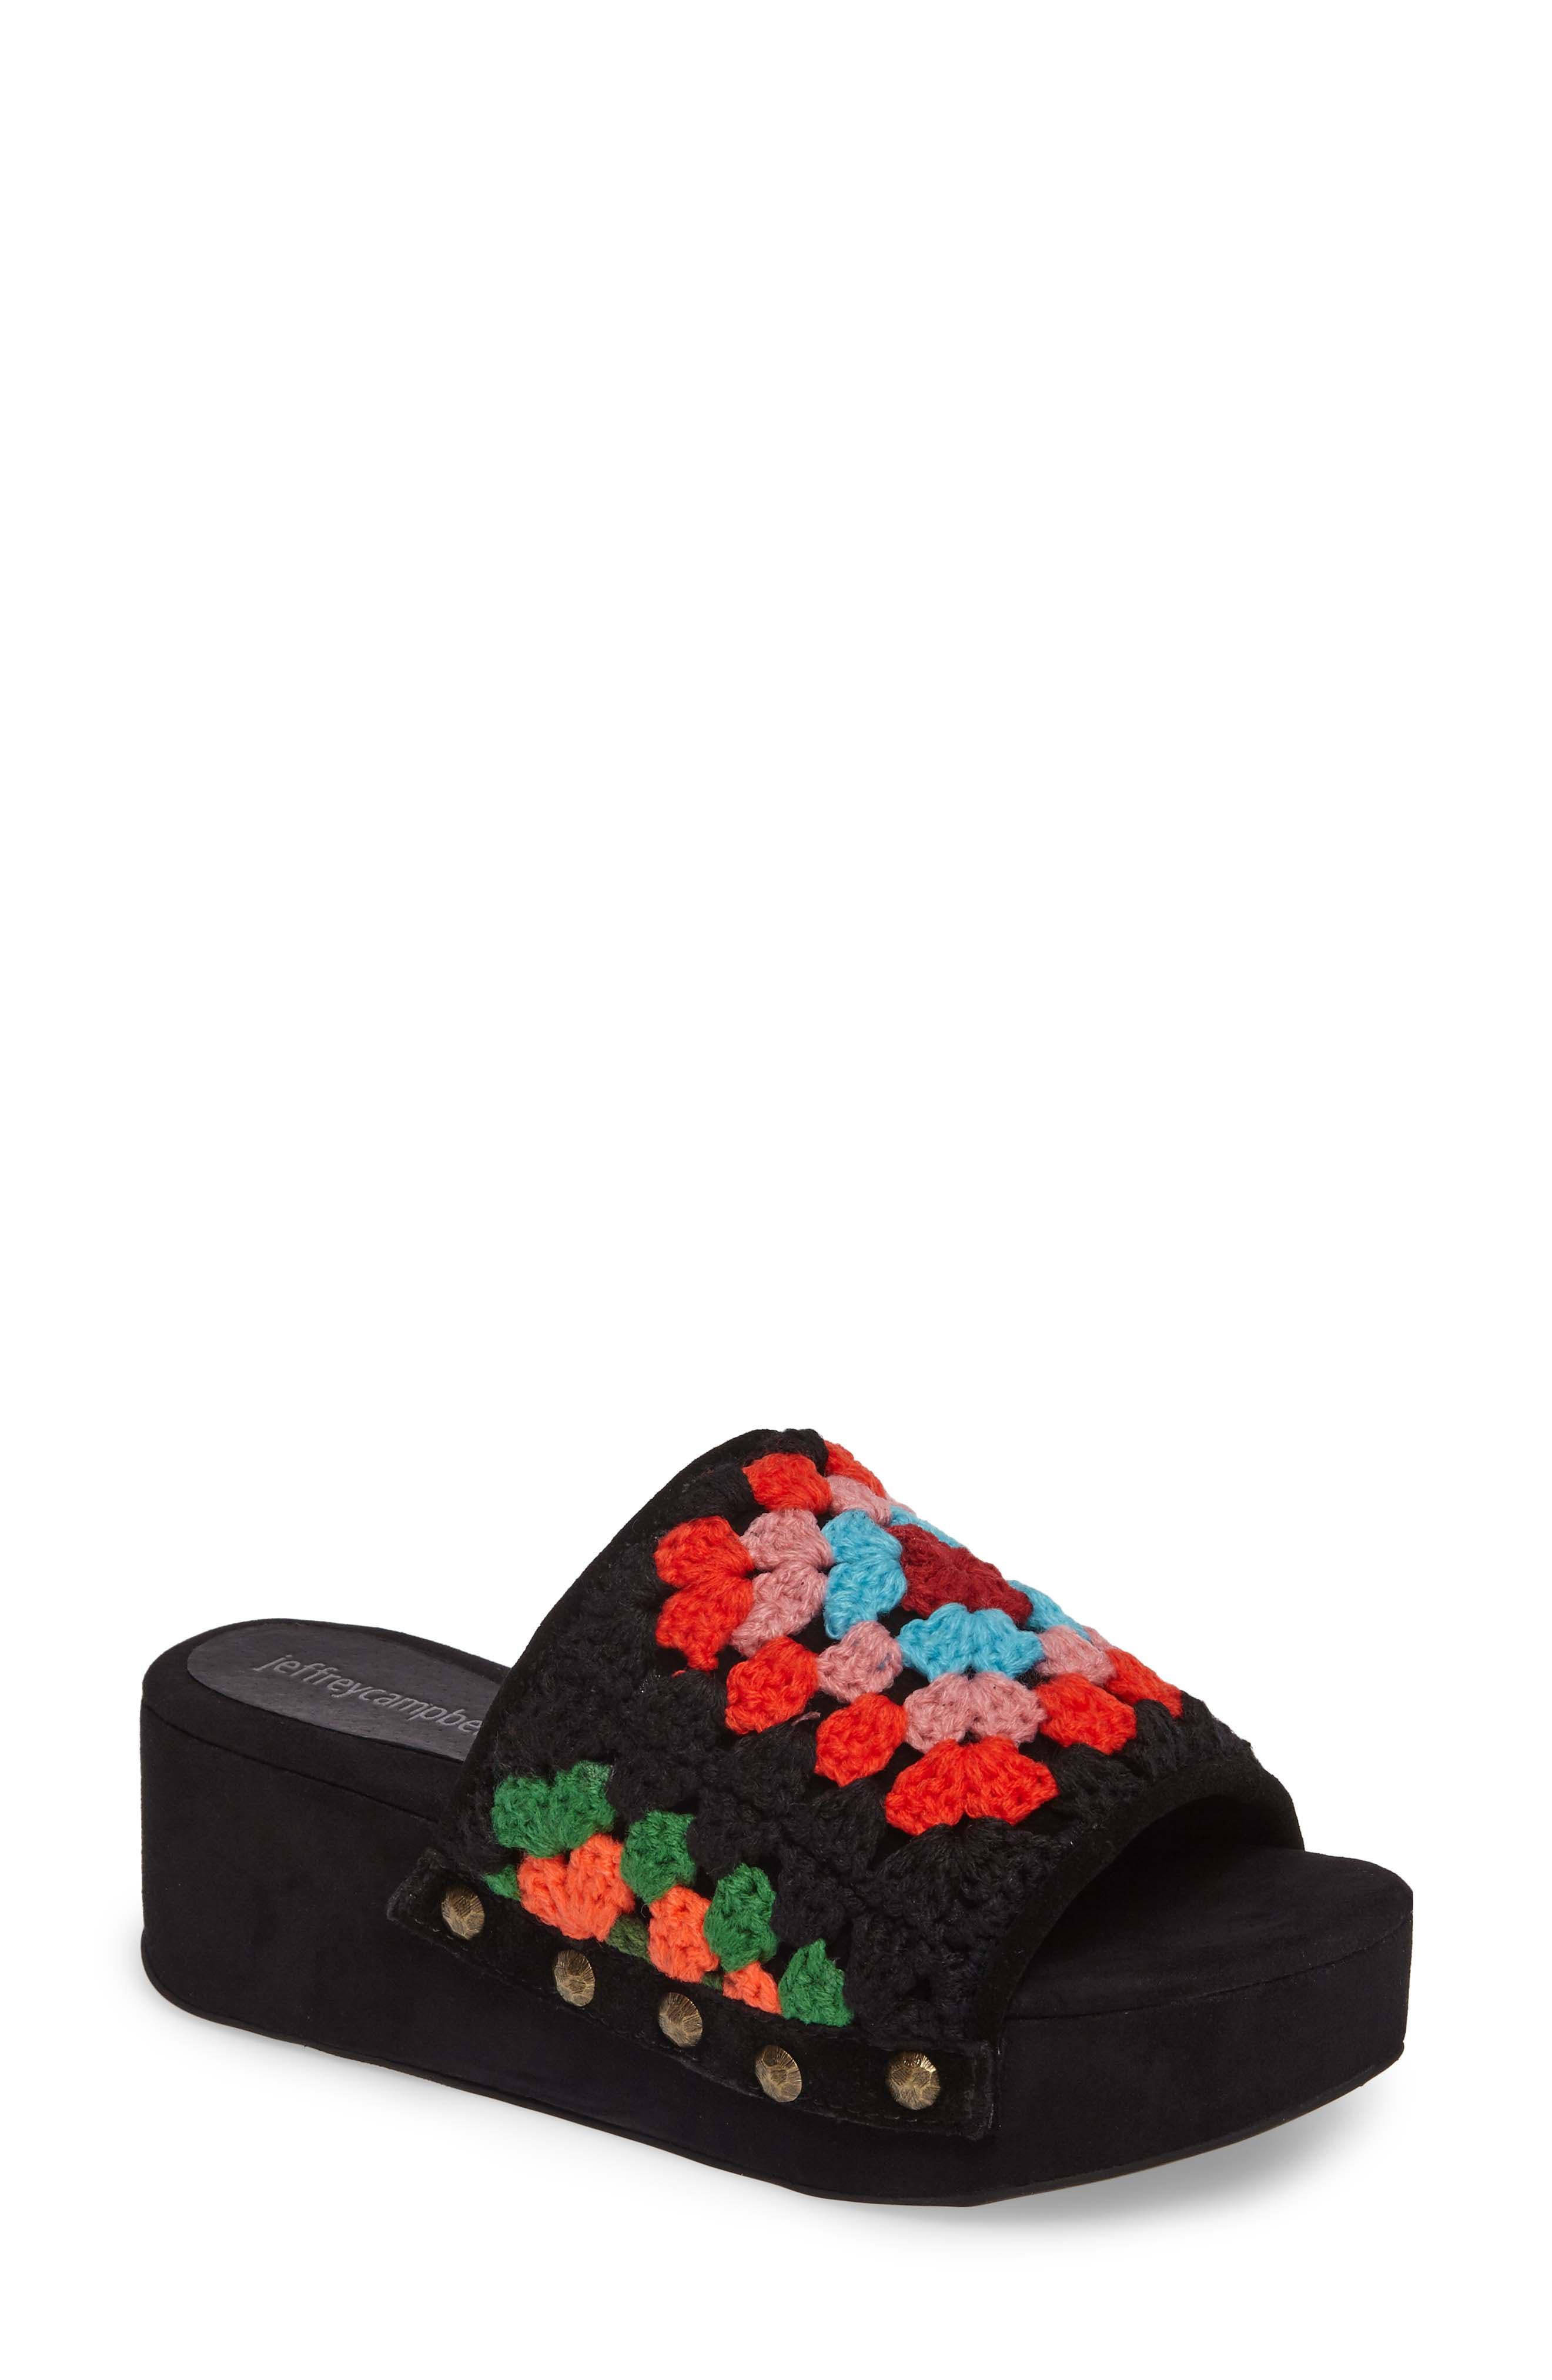 Jeffrey Campbell Women's Nonna Crocheted Platform Slide Sandal 0va4ao